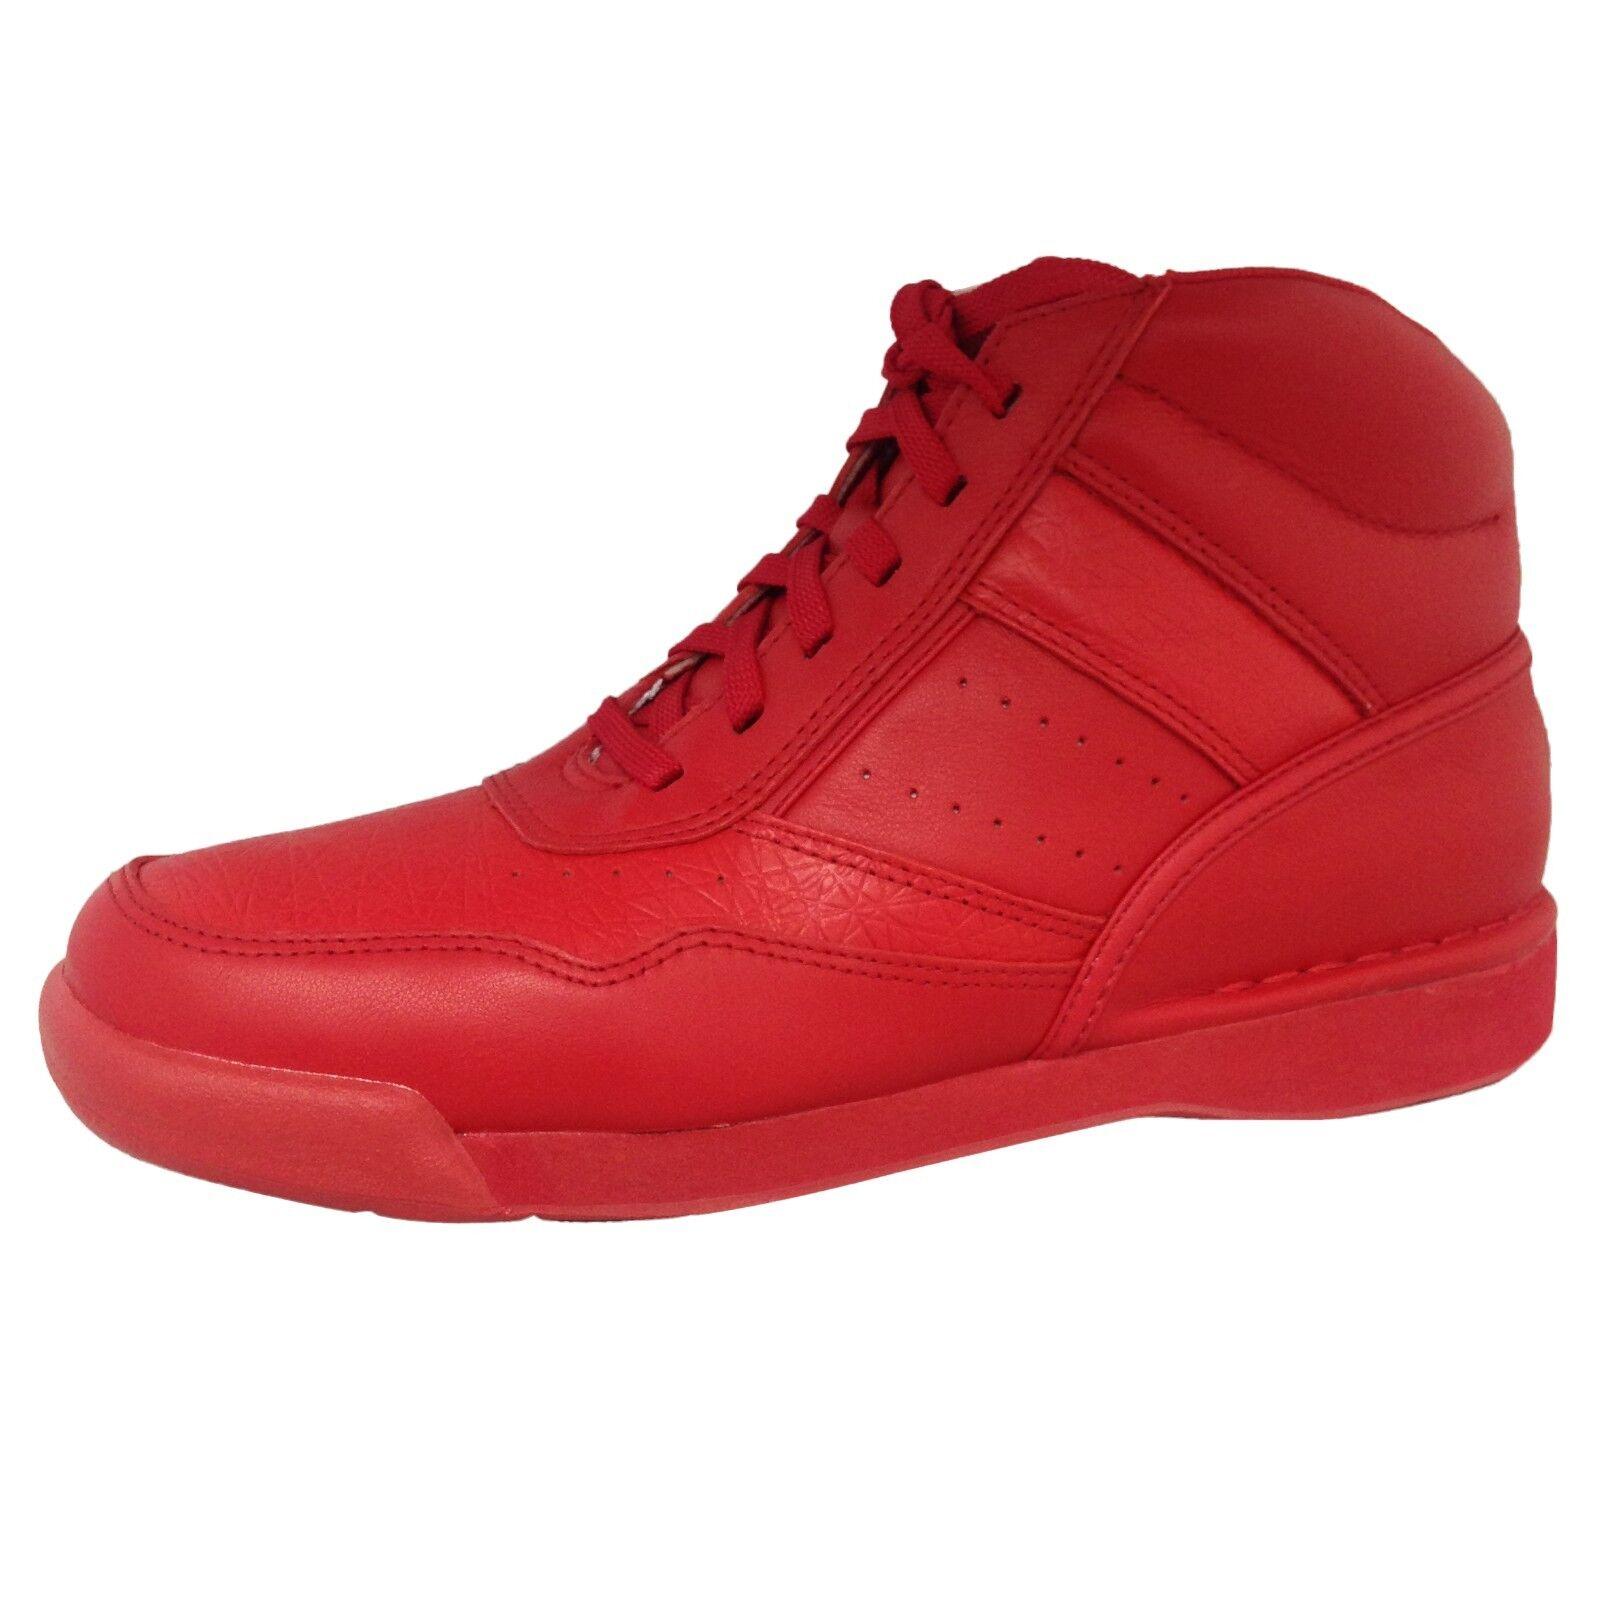 Scarpe casual da uomo  Rockport 7100 Formula High Formula 7100 1 Red Walking Shoe 71e57b